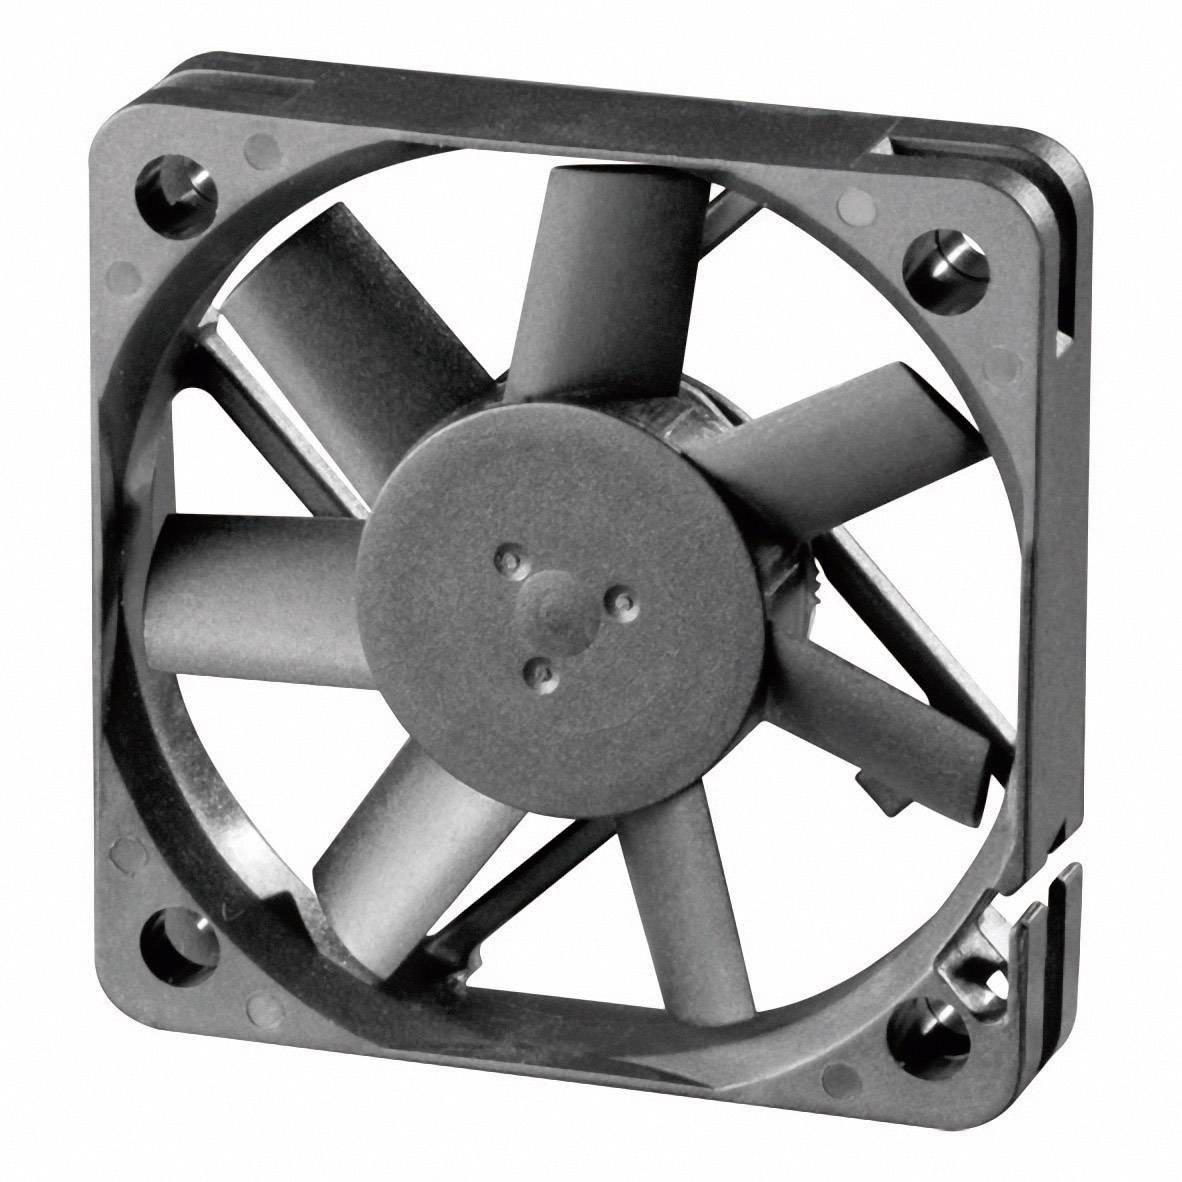 Axiálny ventilátor Sunon EE50100S1-000U-999 EE50100S1-000U-999, 5 V/DC, 30 dB, (d x š x v) 50 x 50 x 10 mm